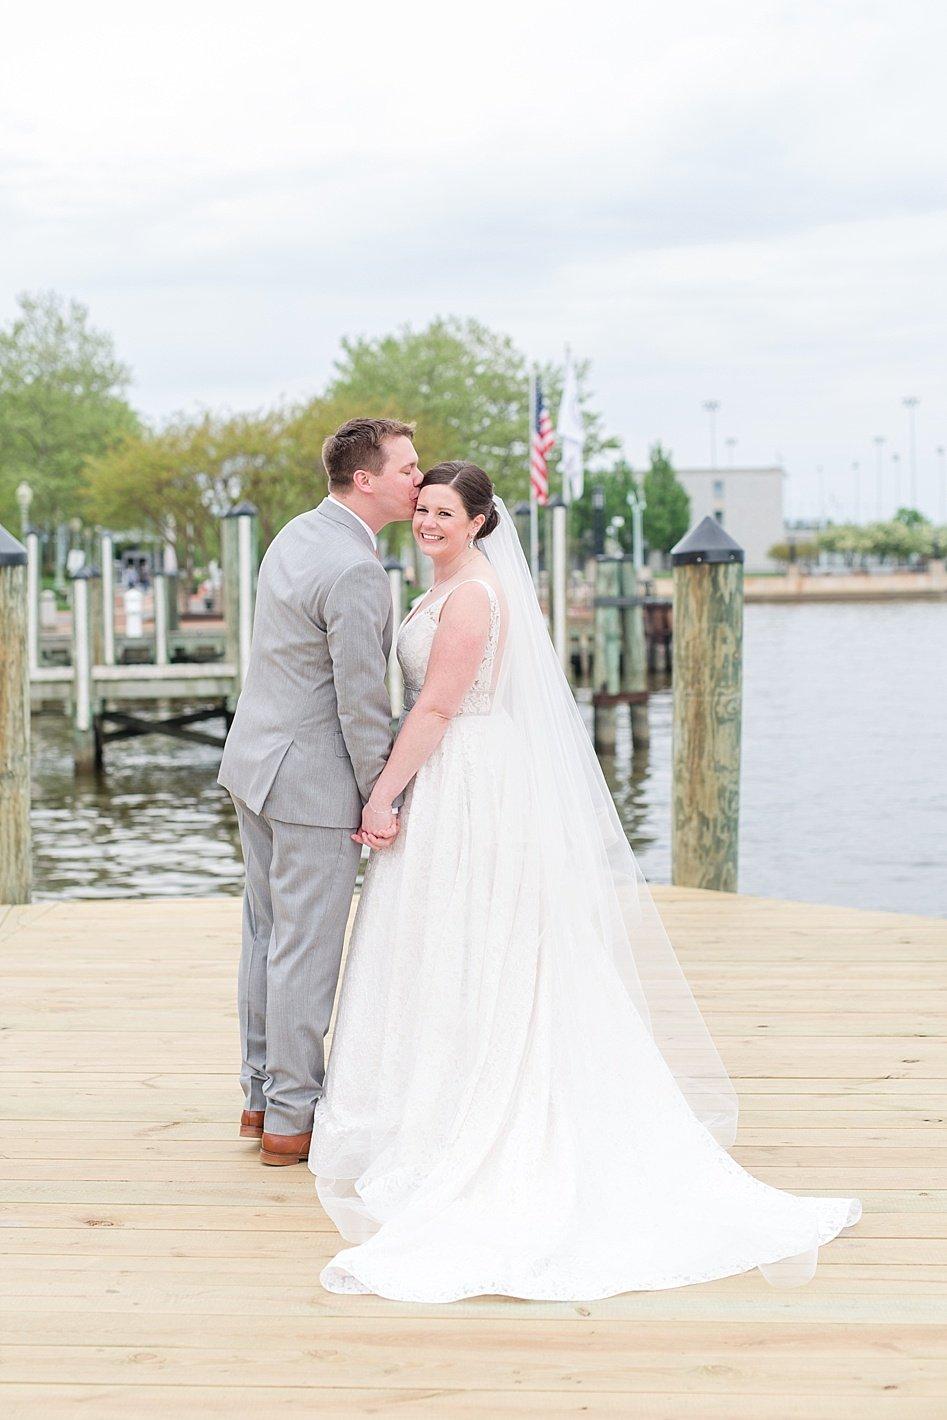 Bride and groom portraits Annapolis wedding Arpasi photography